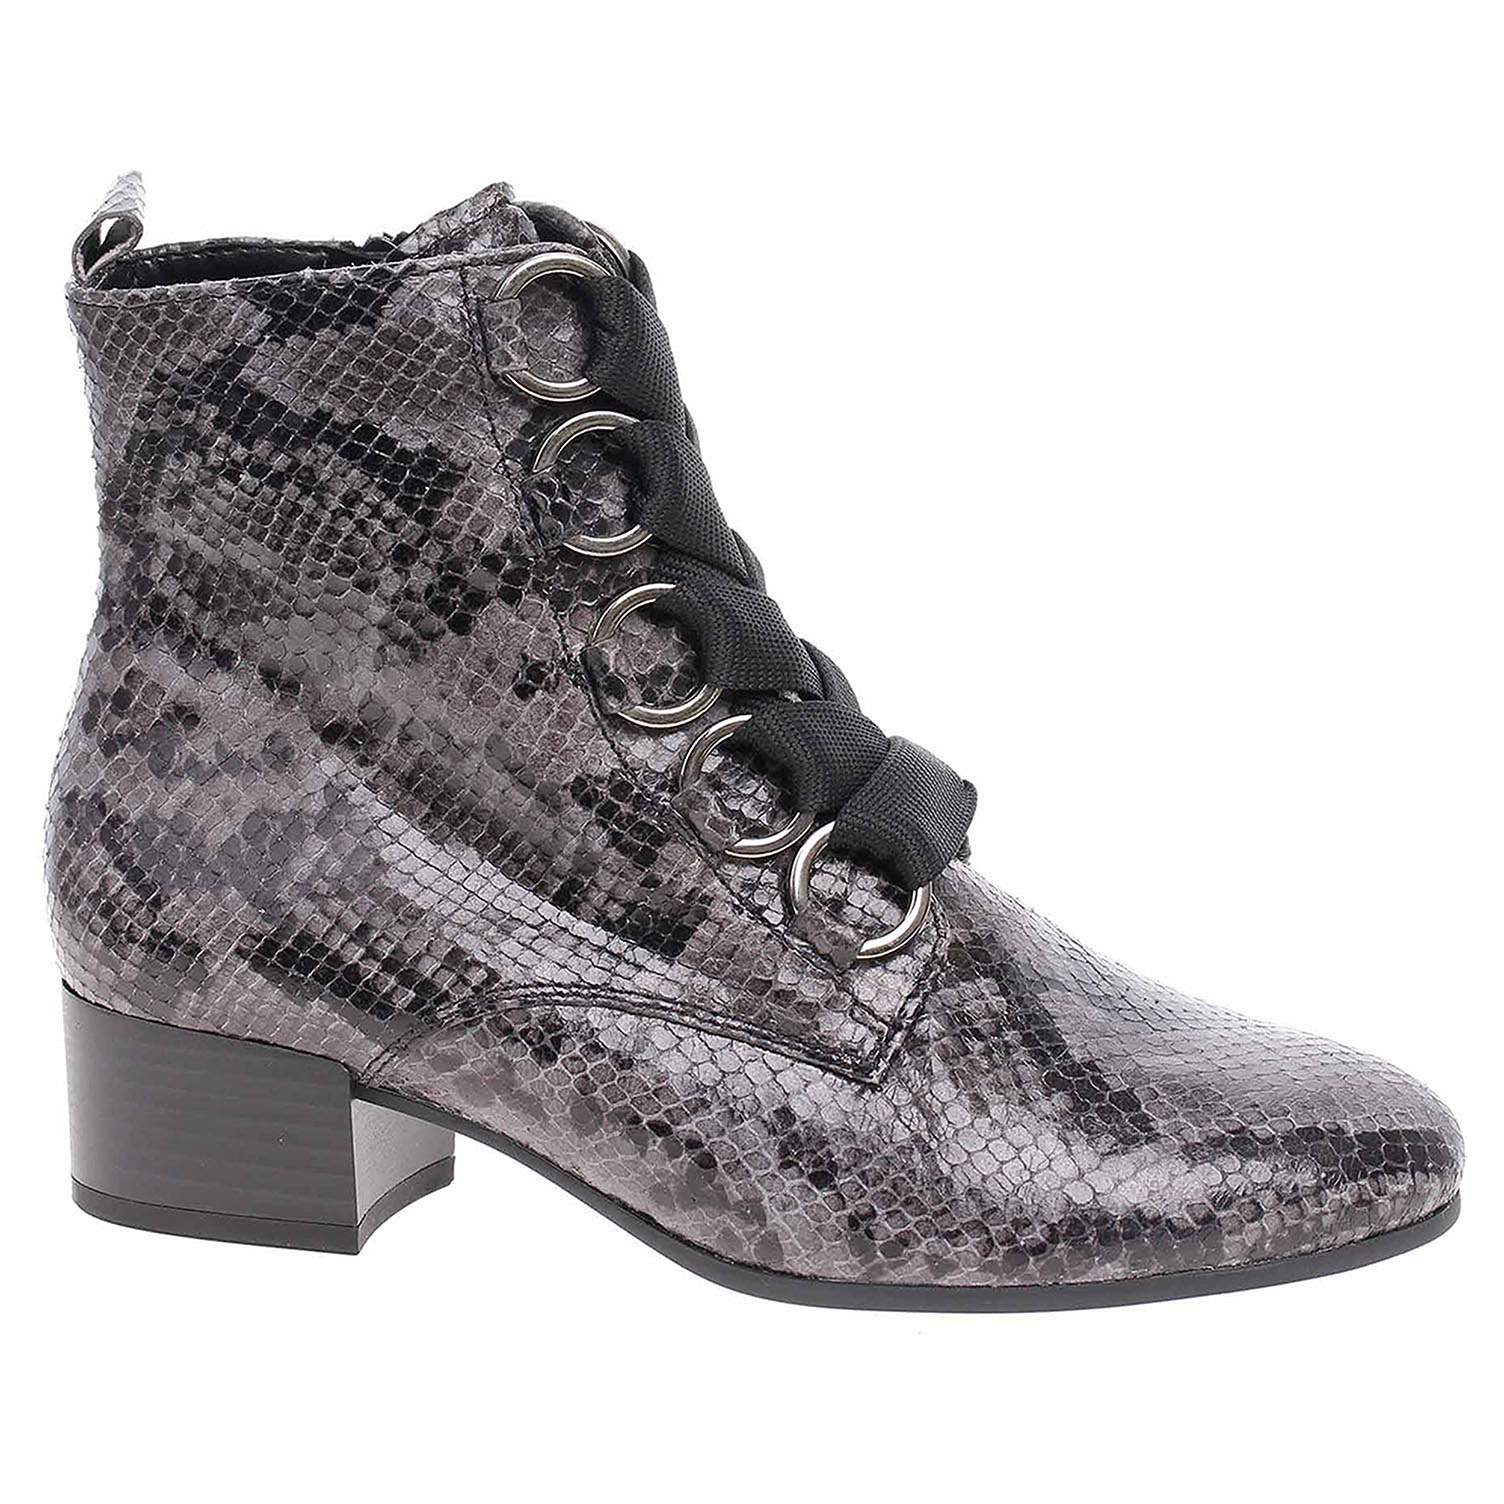 Dámská kotníková obuv Gabor 32.815.40 dark-grey 32.815.40 39